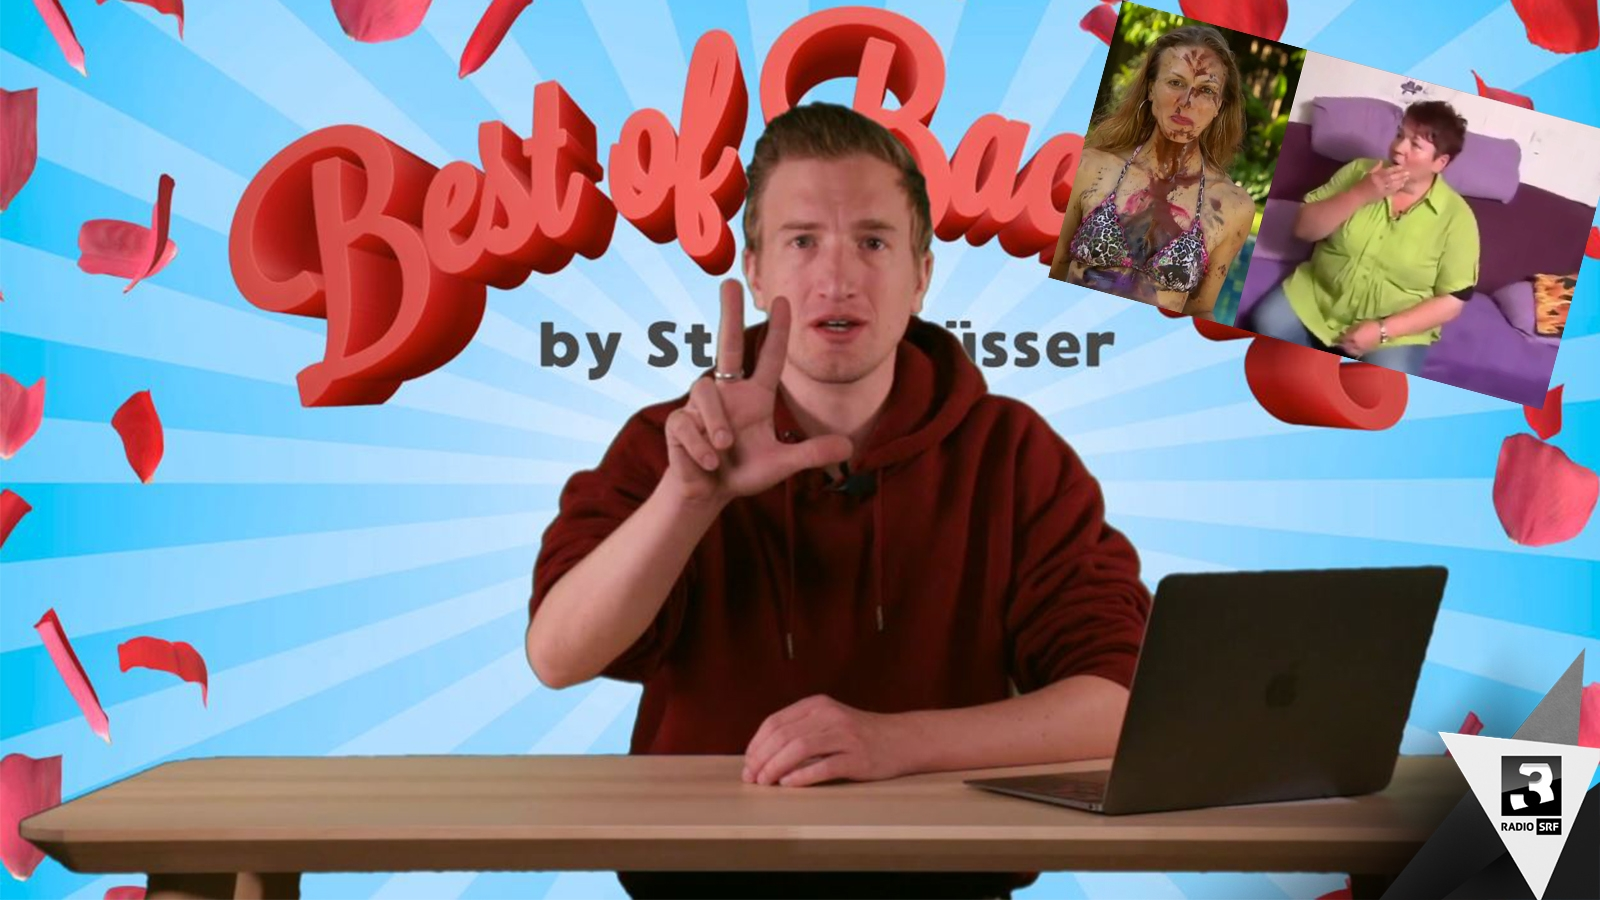 Stefan Büssers Best of Bachelor: Folge 3